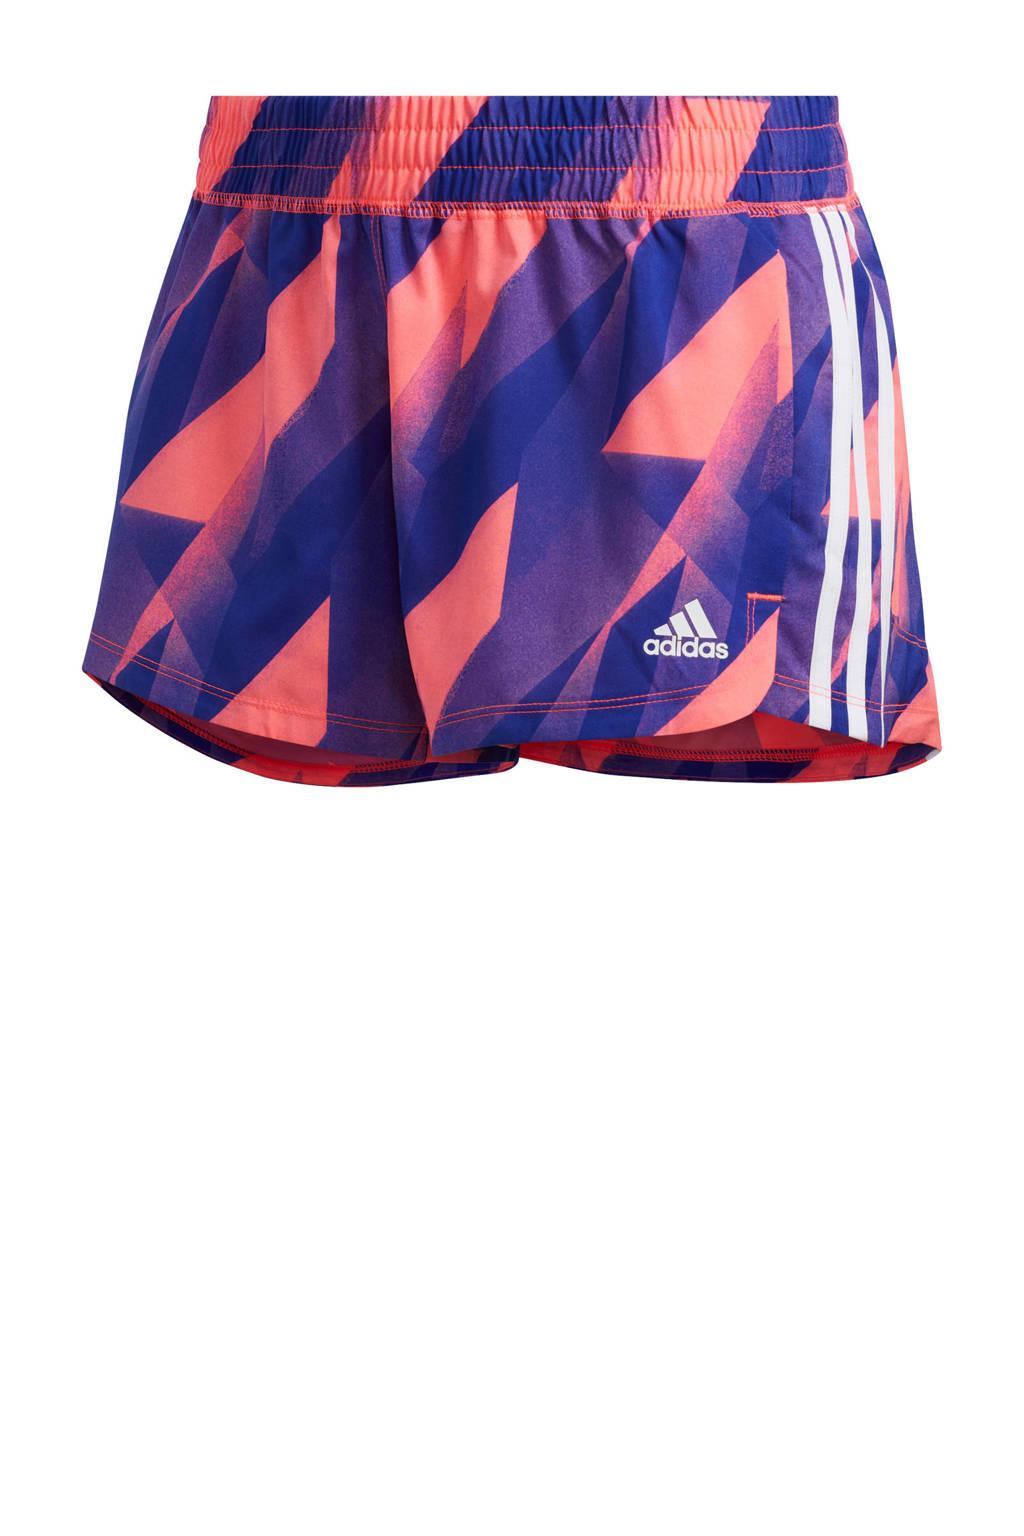 adidas Performance sportshort paars/roze, Paars/roze